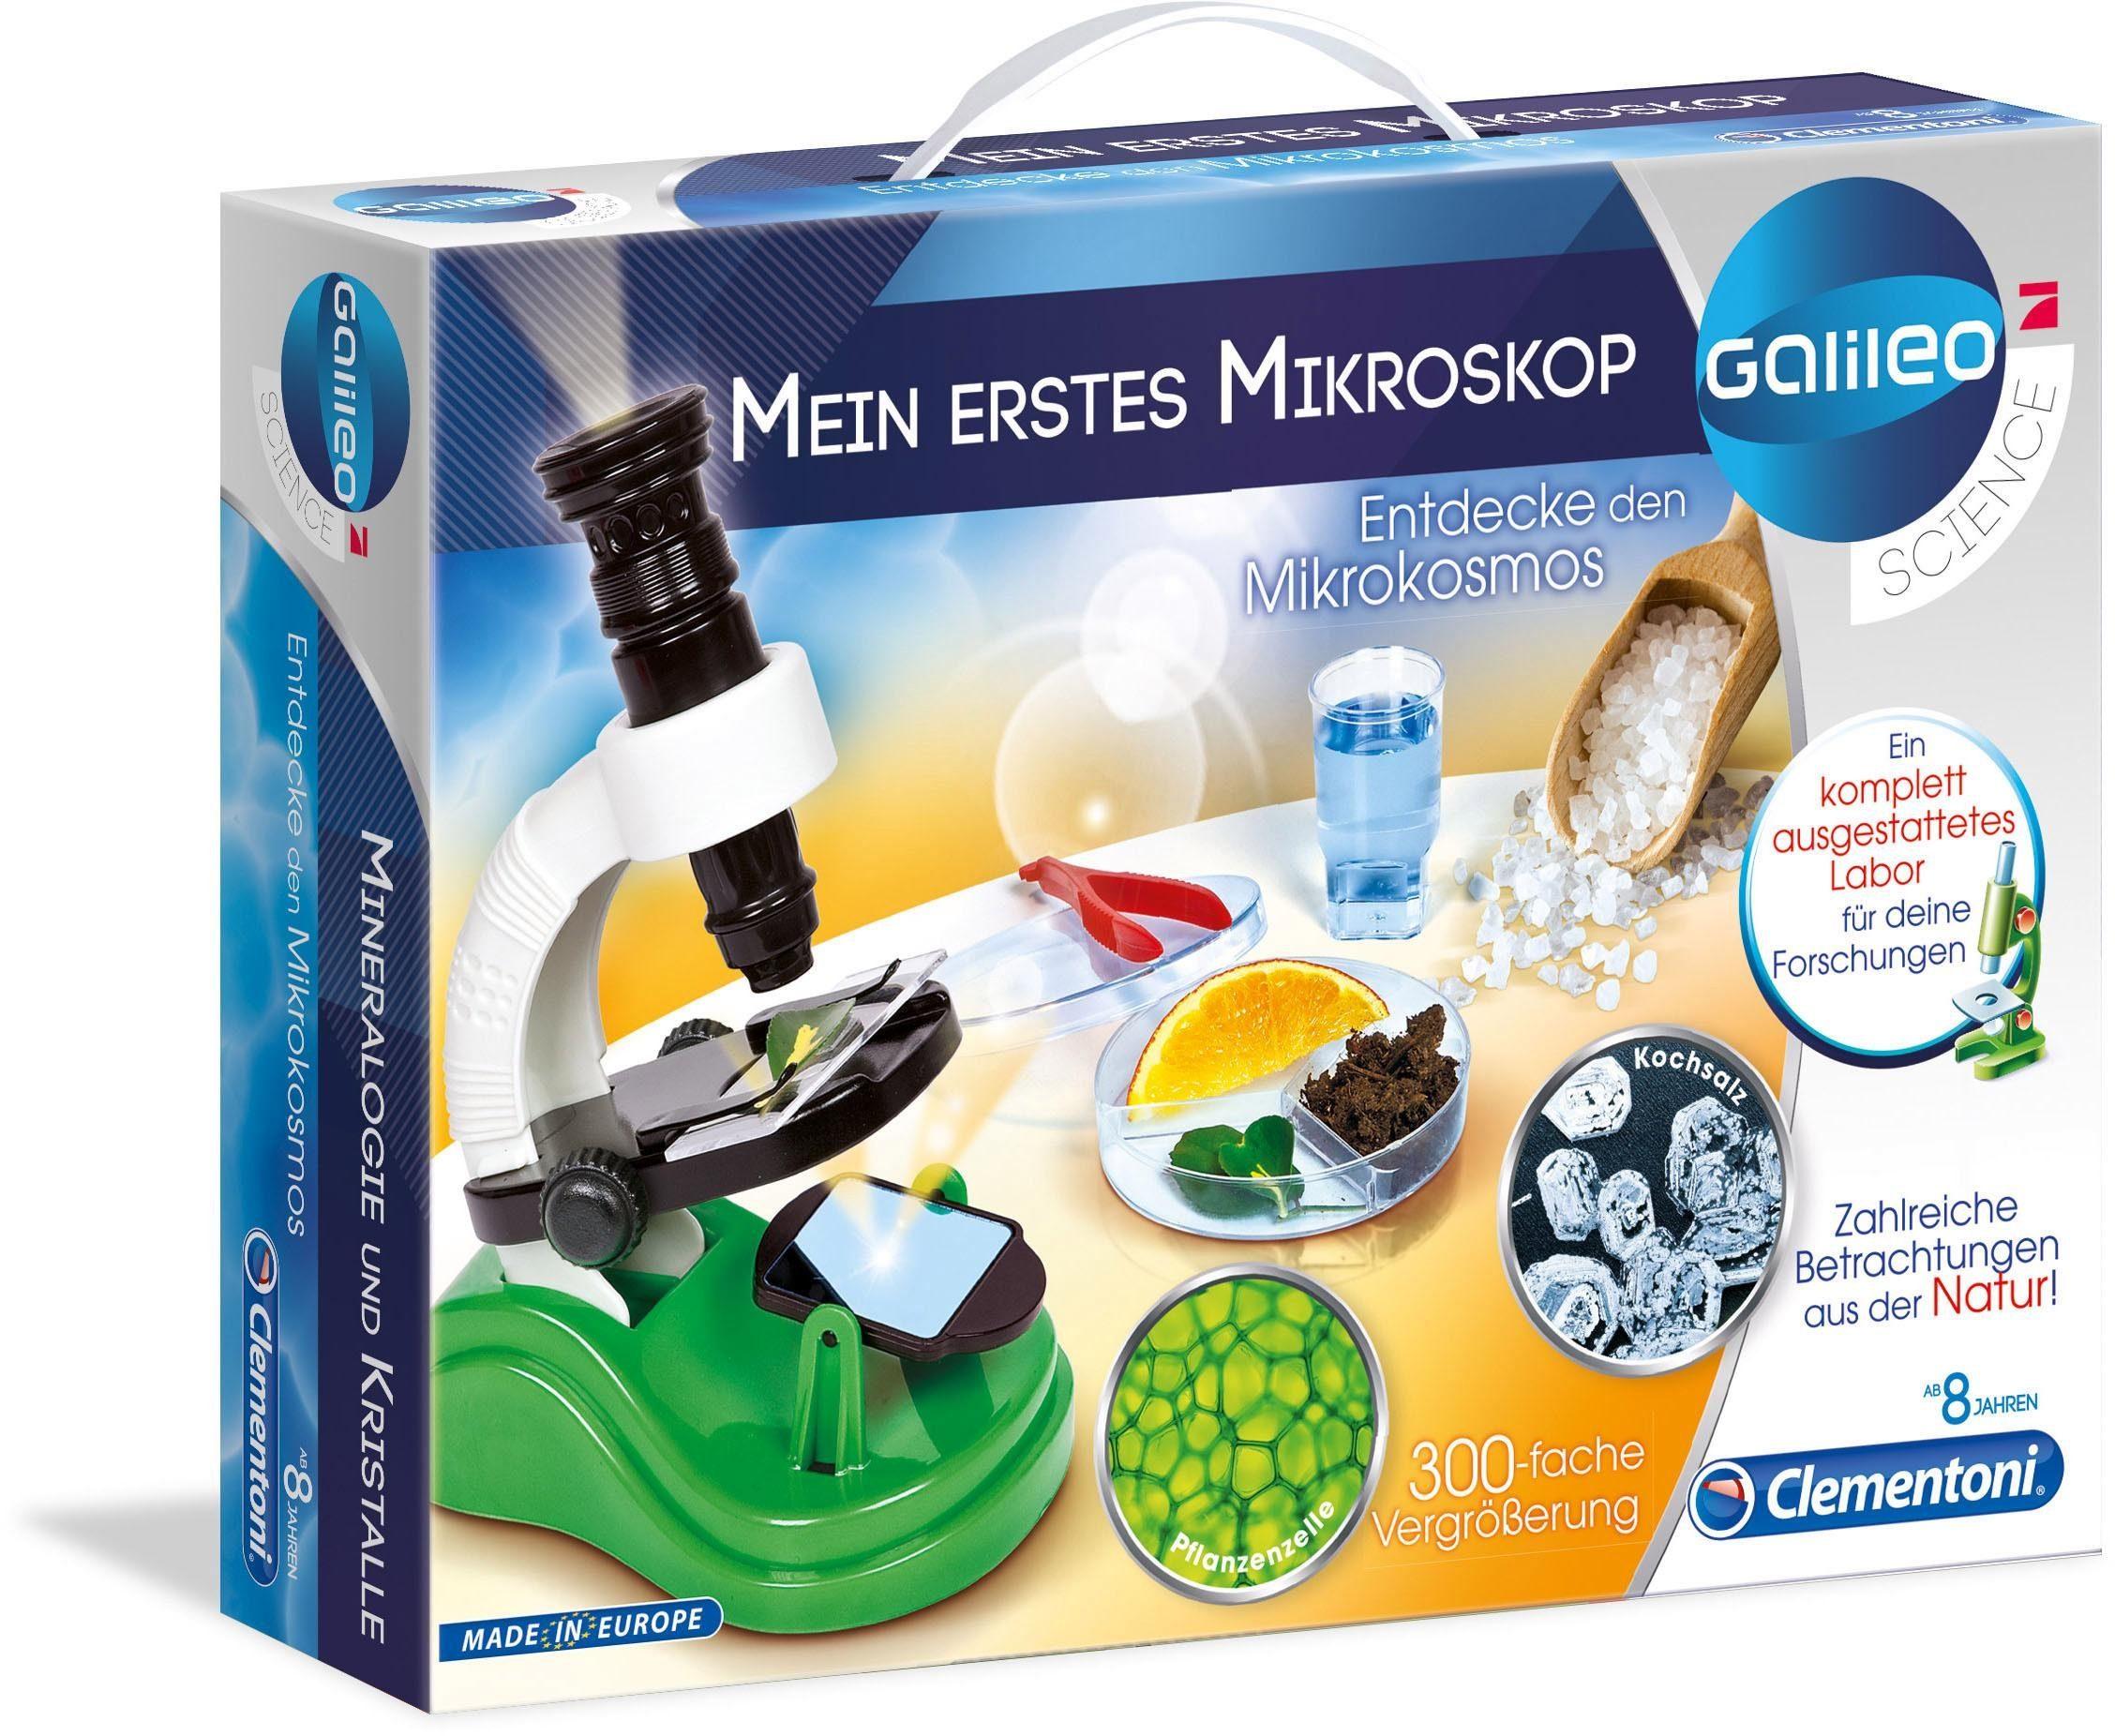 Clementoni Experimentierkasten, »Galileo Mein erstes Mikroskop«